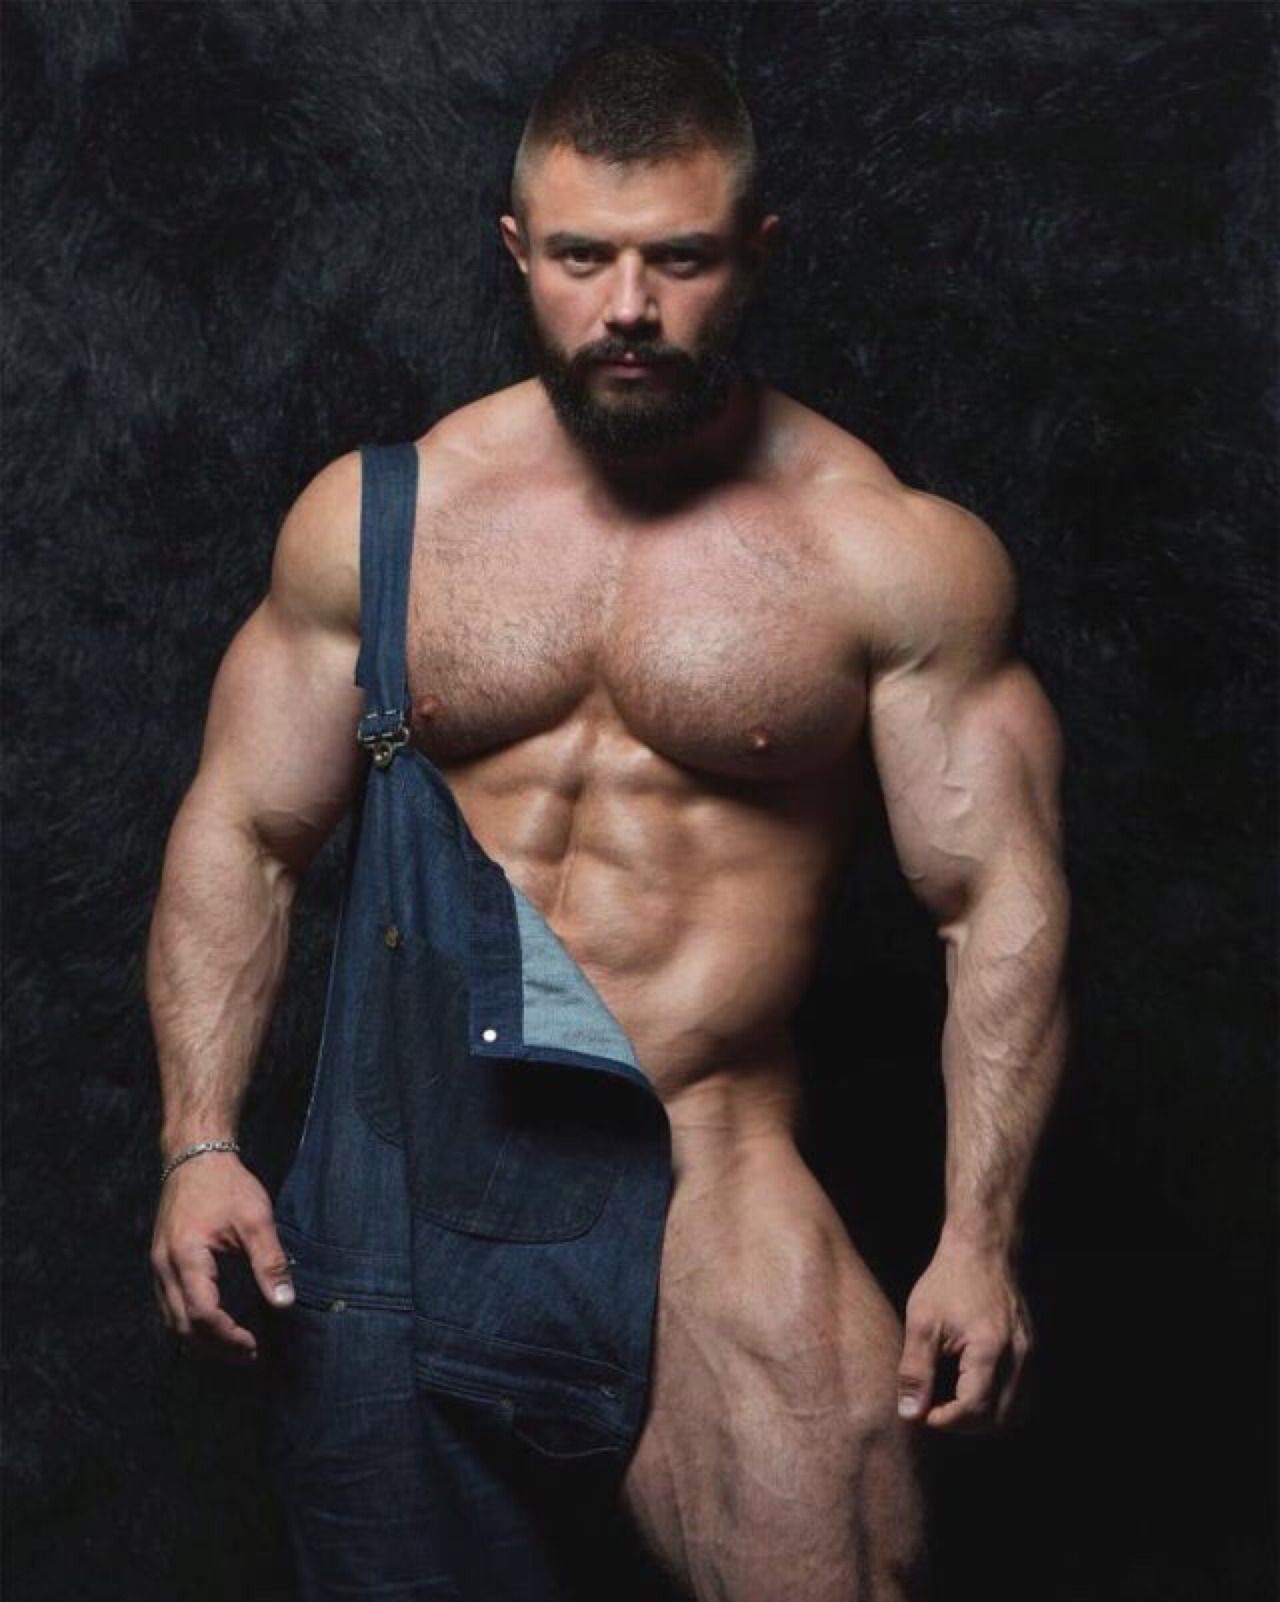 Hairy Muscular Hunk